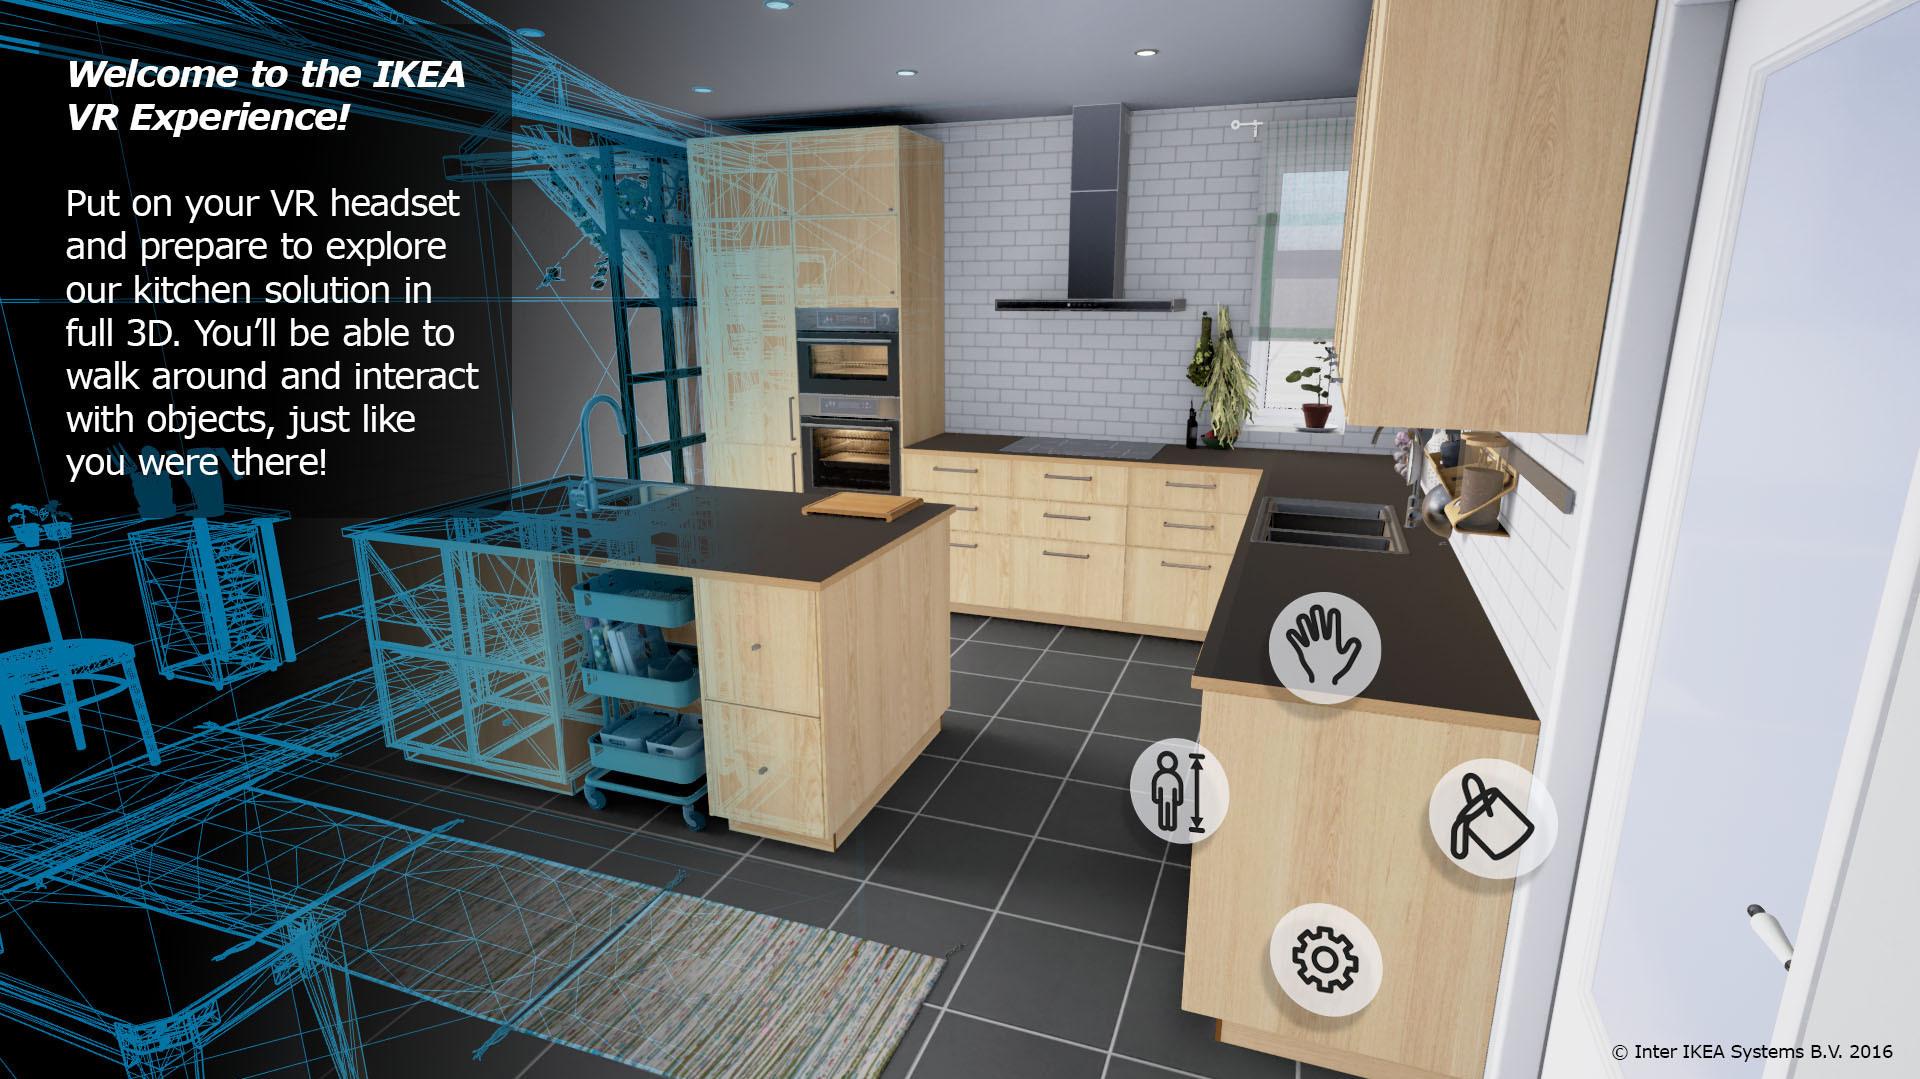 Virtual reality: ikea schickt kunden in virtuelle rundgänge seines ...